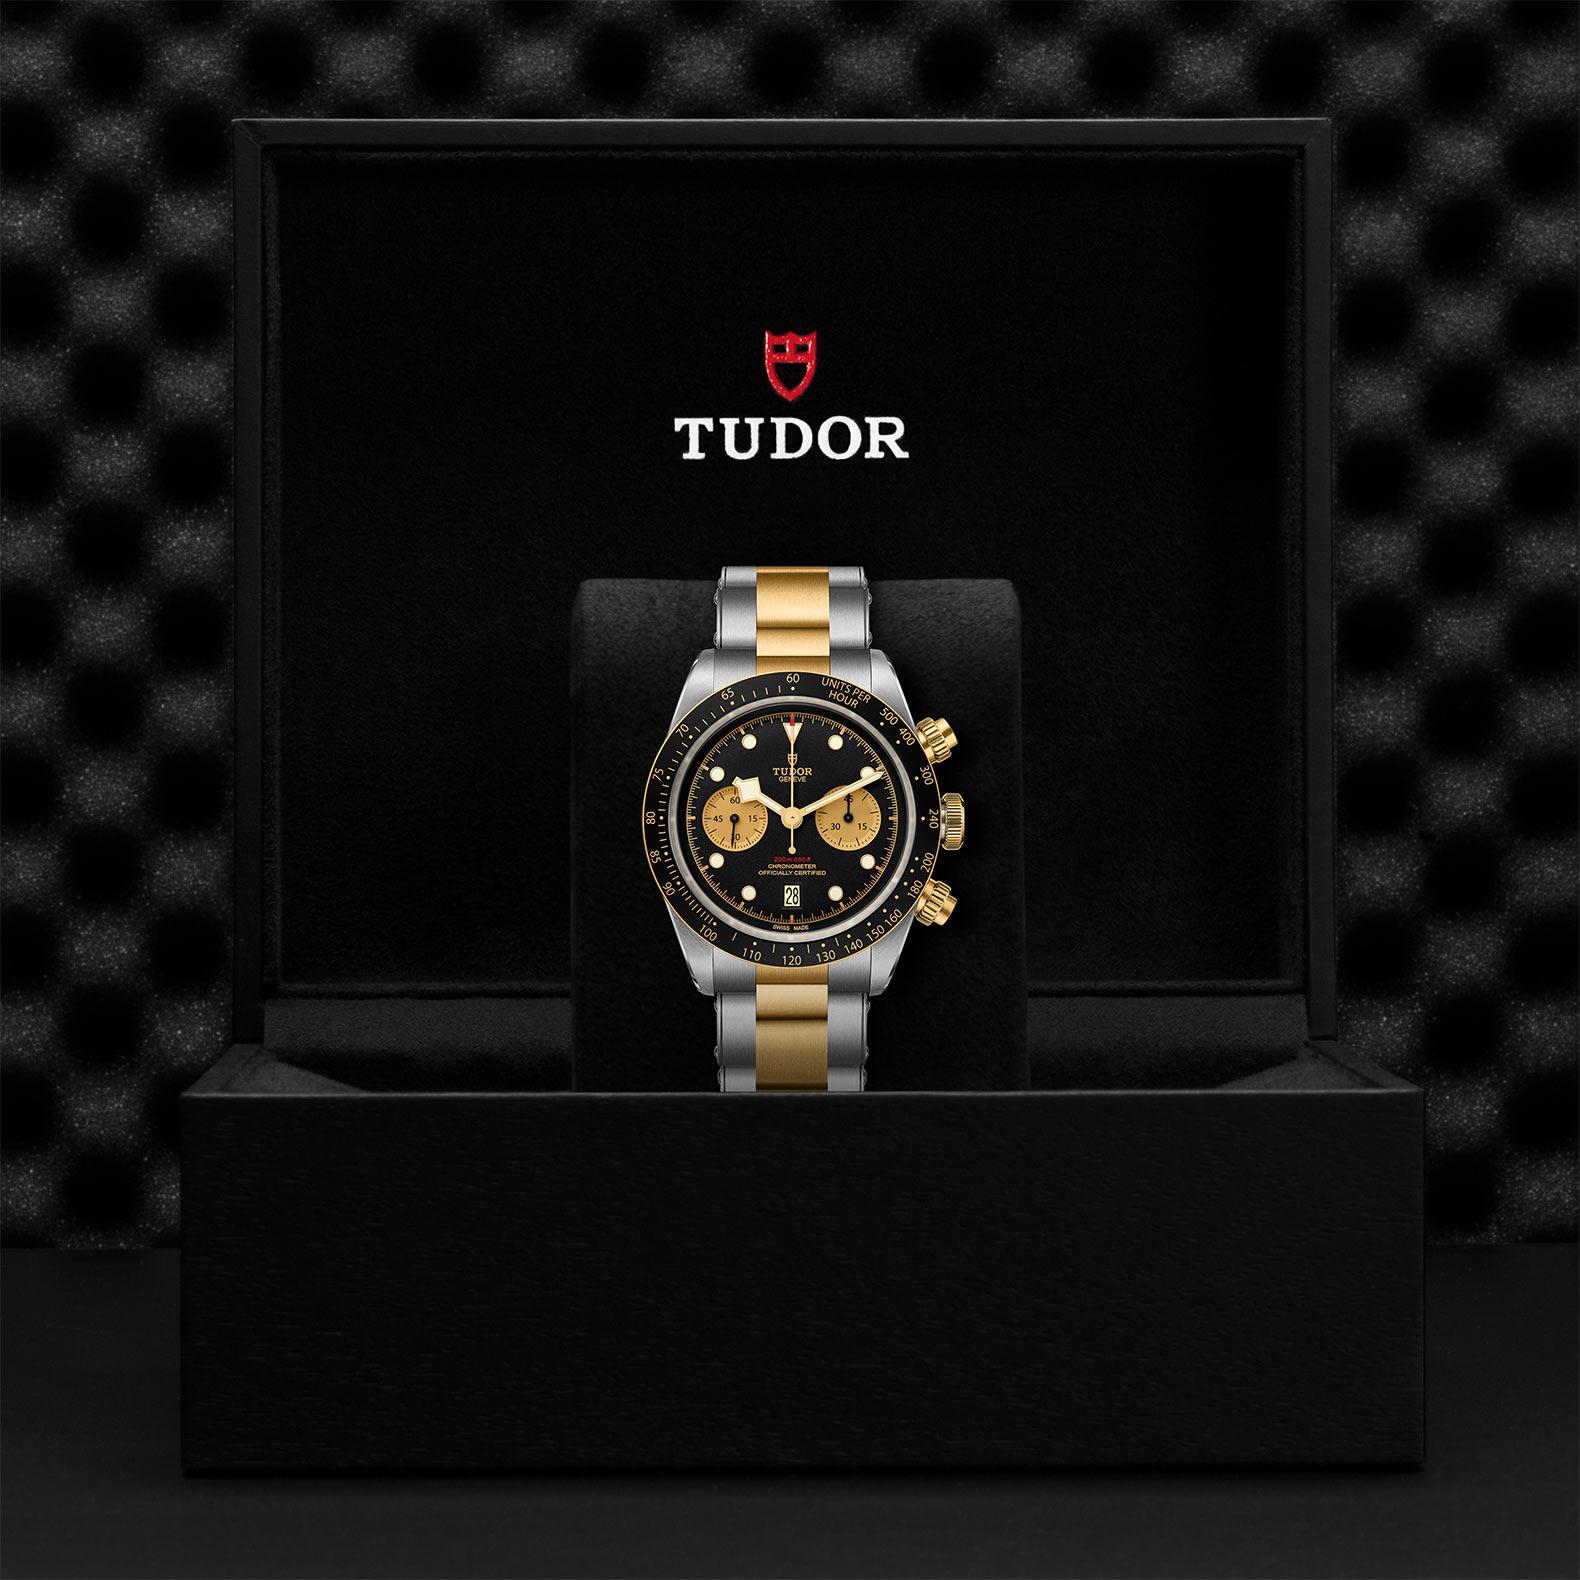 Tudor_M79363n-0001